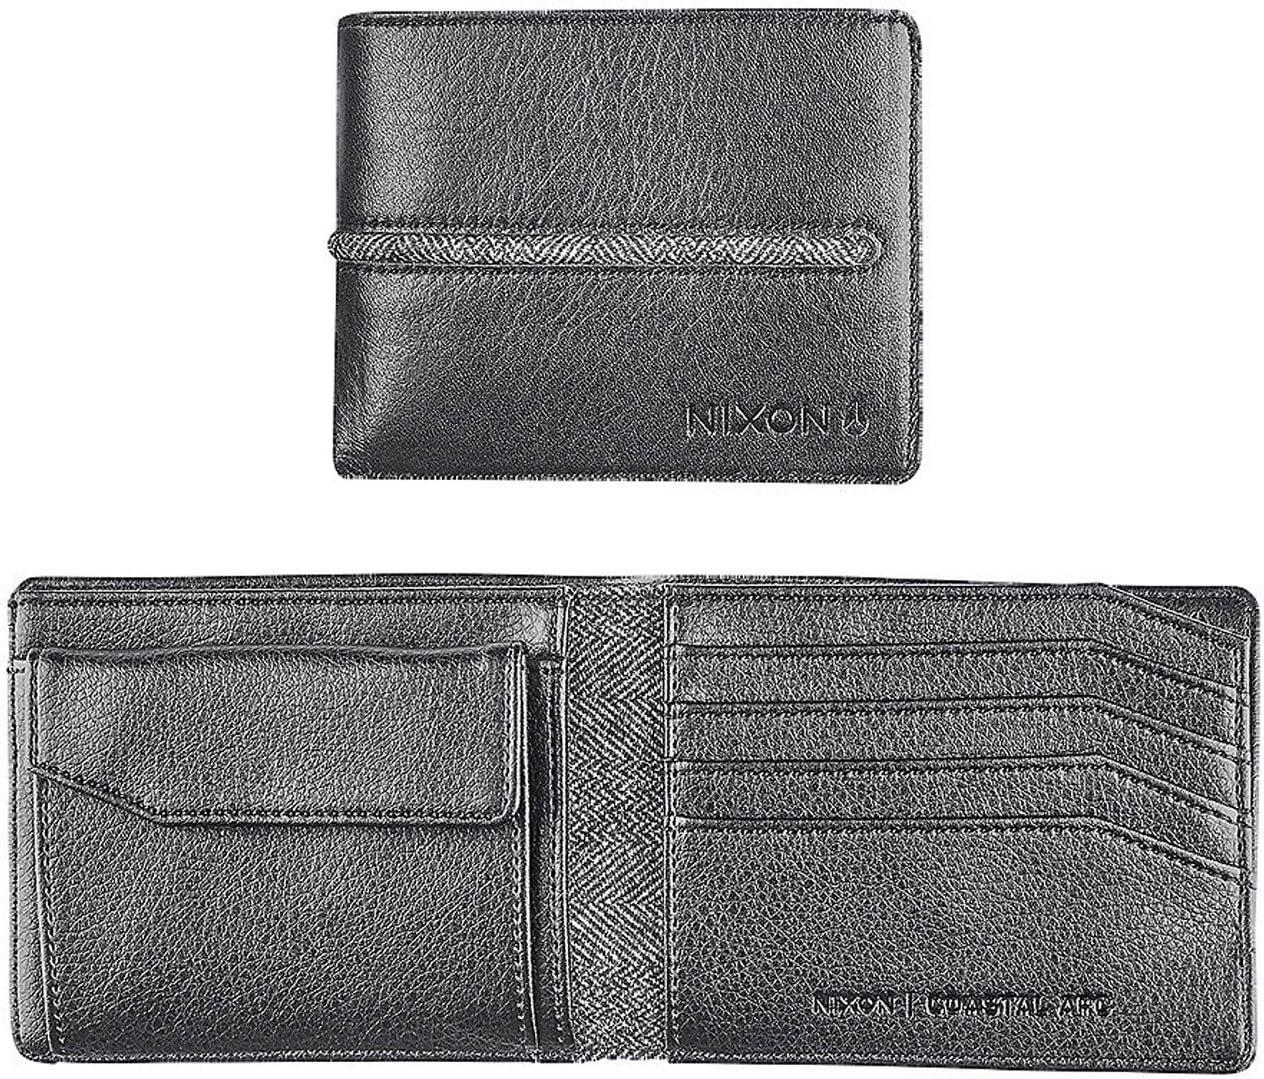 Schwarz Nixon Coastal Arc Bi-Fold Coin Wallet M/ünzb/örse